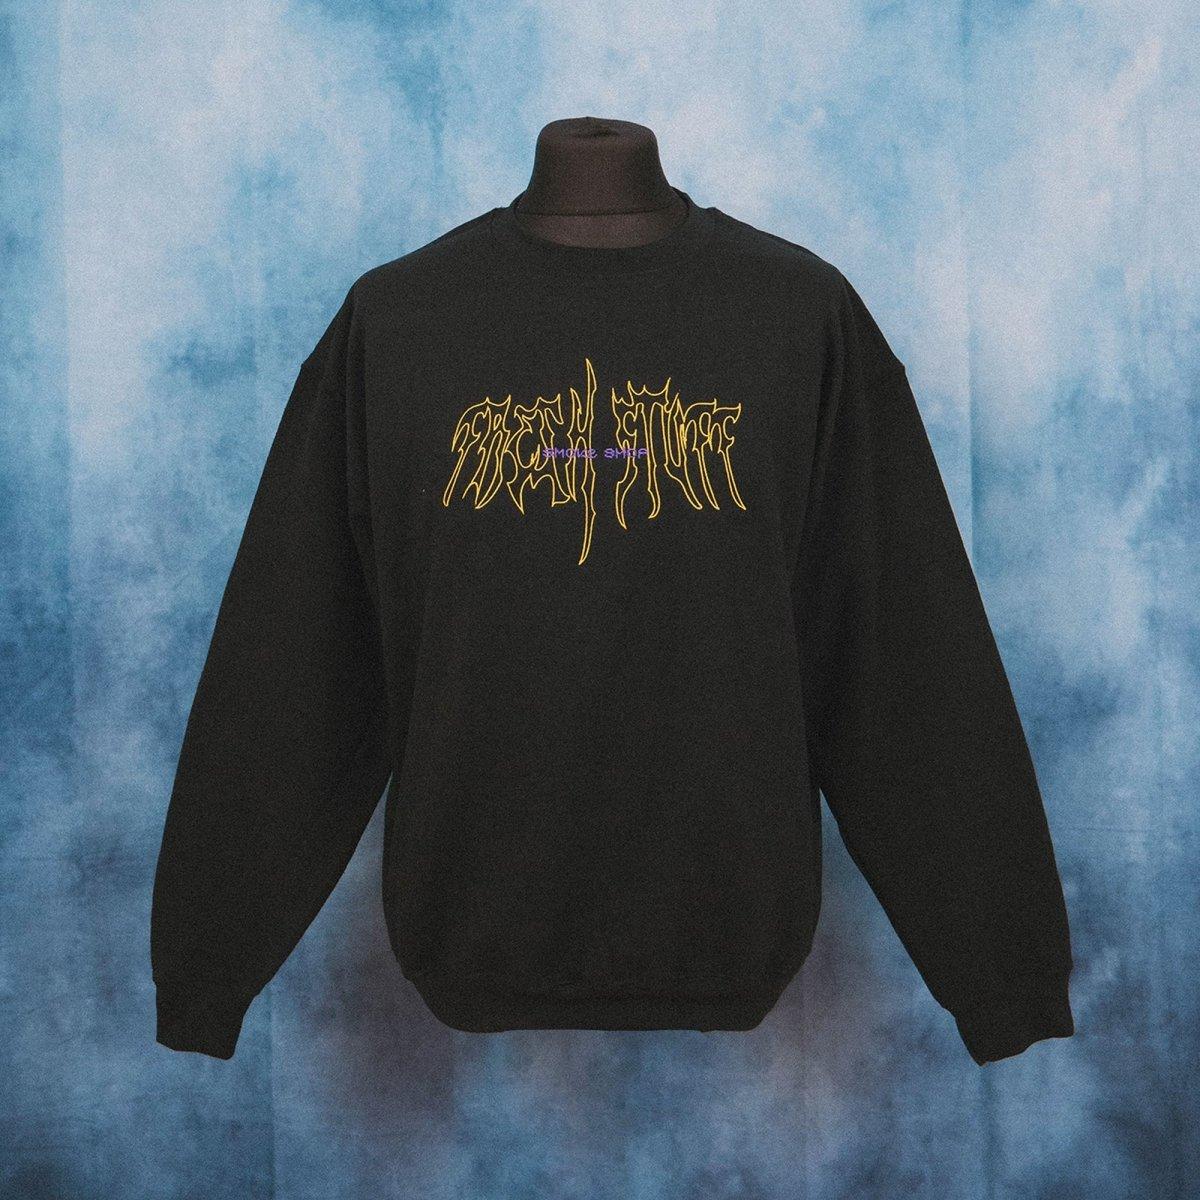 Smoke Shop Black Unisex Embroidered Sweater